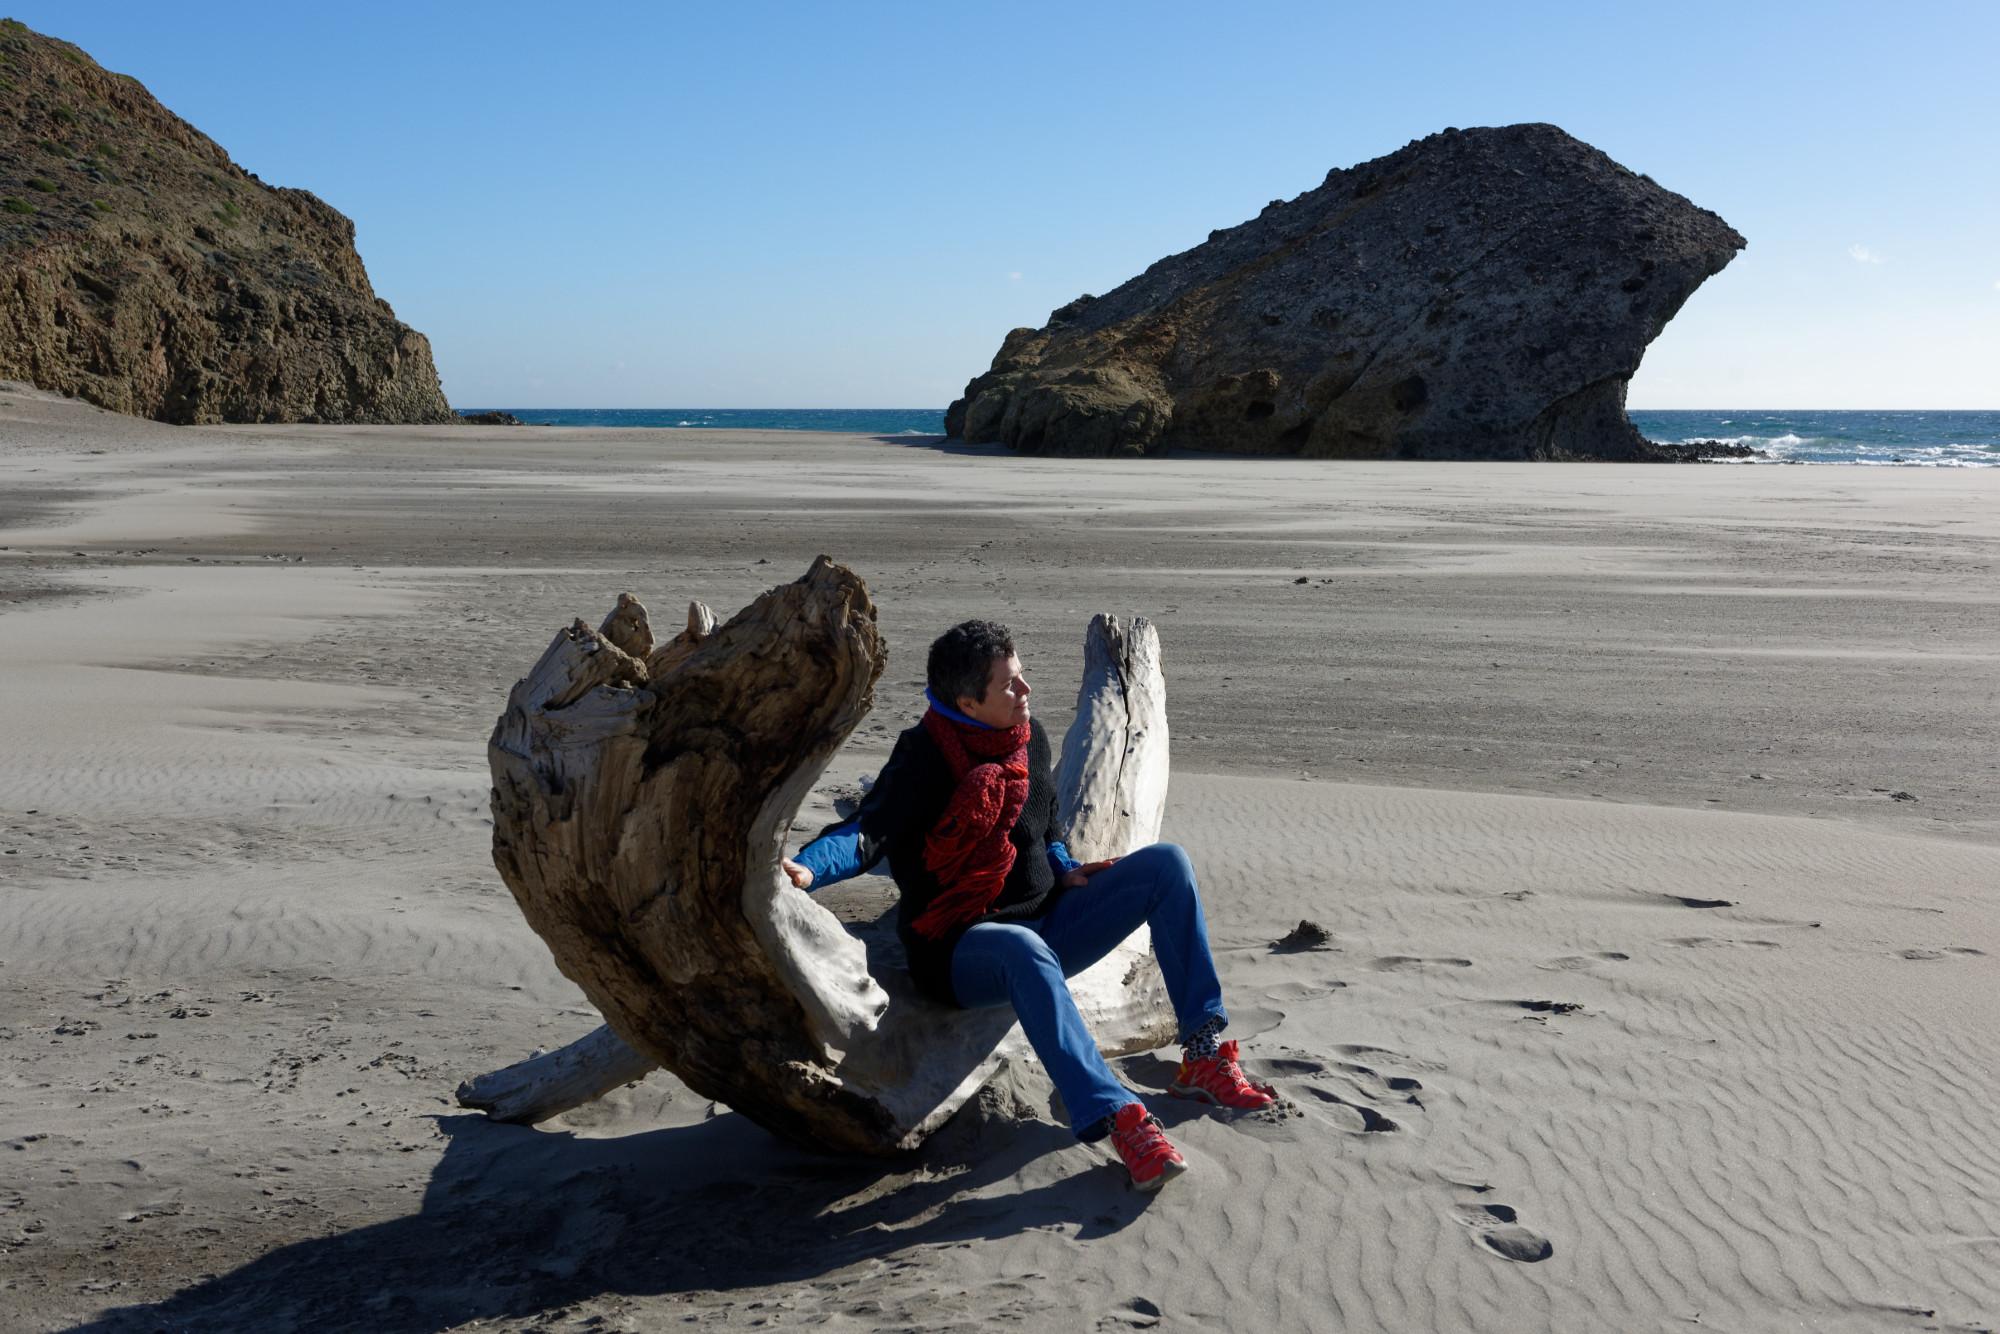 171214-San Jose-Playa del Monsul (Cabo de Gata-Andalousie) (209)